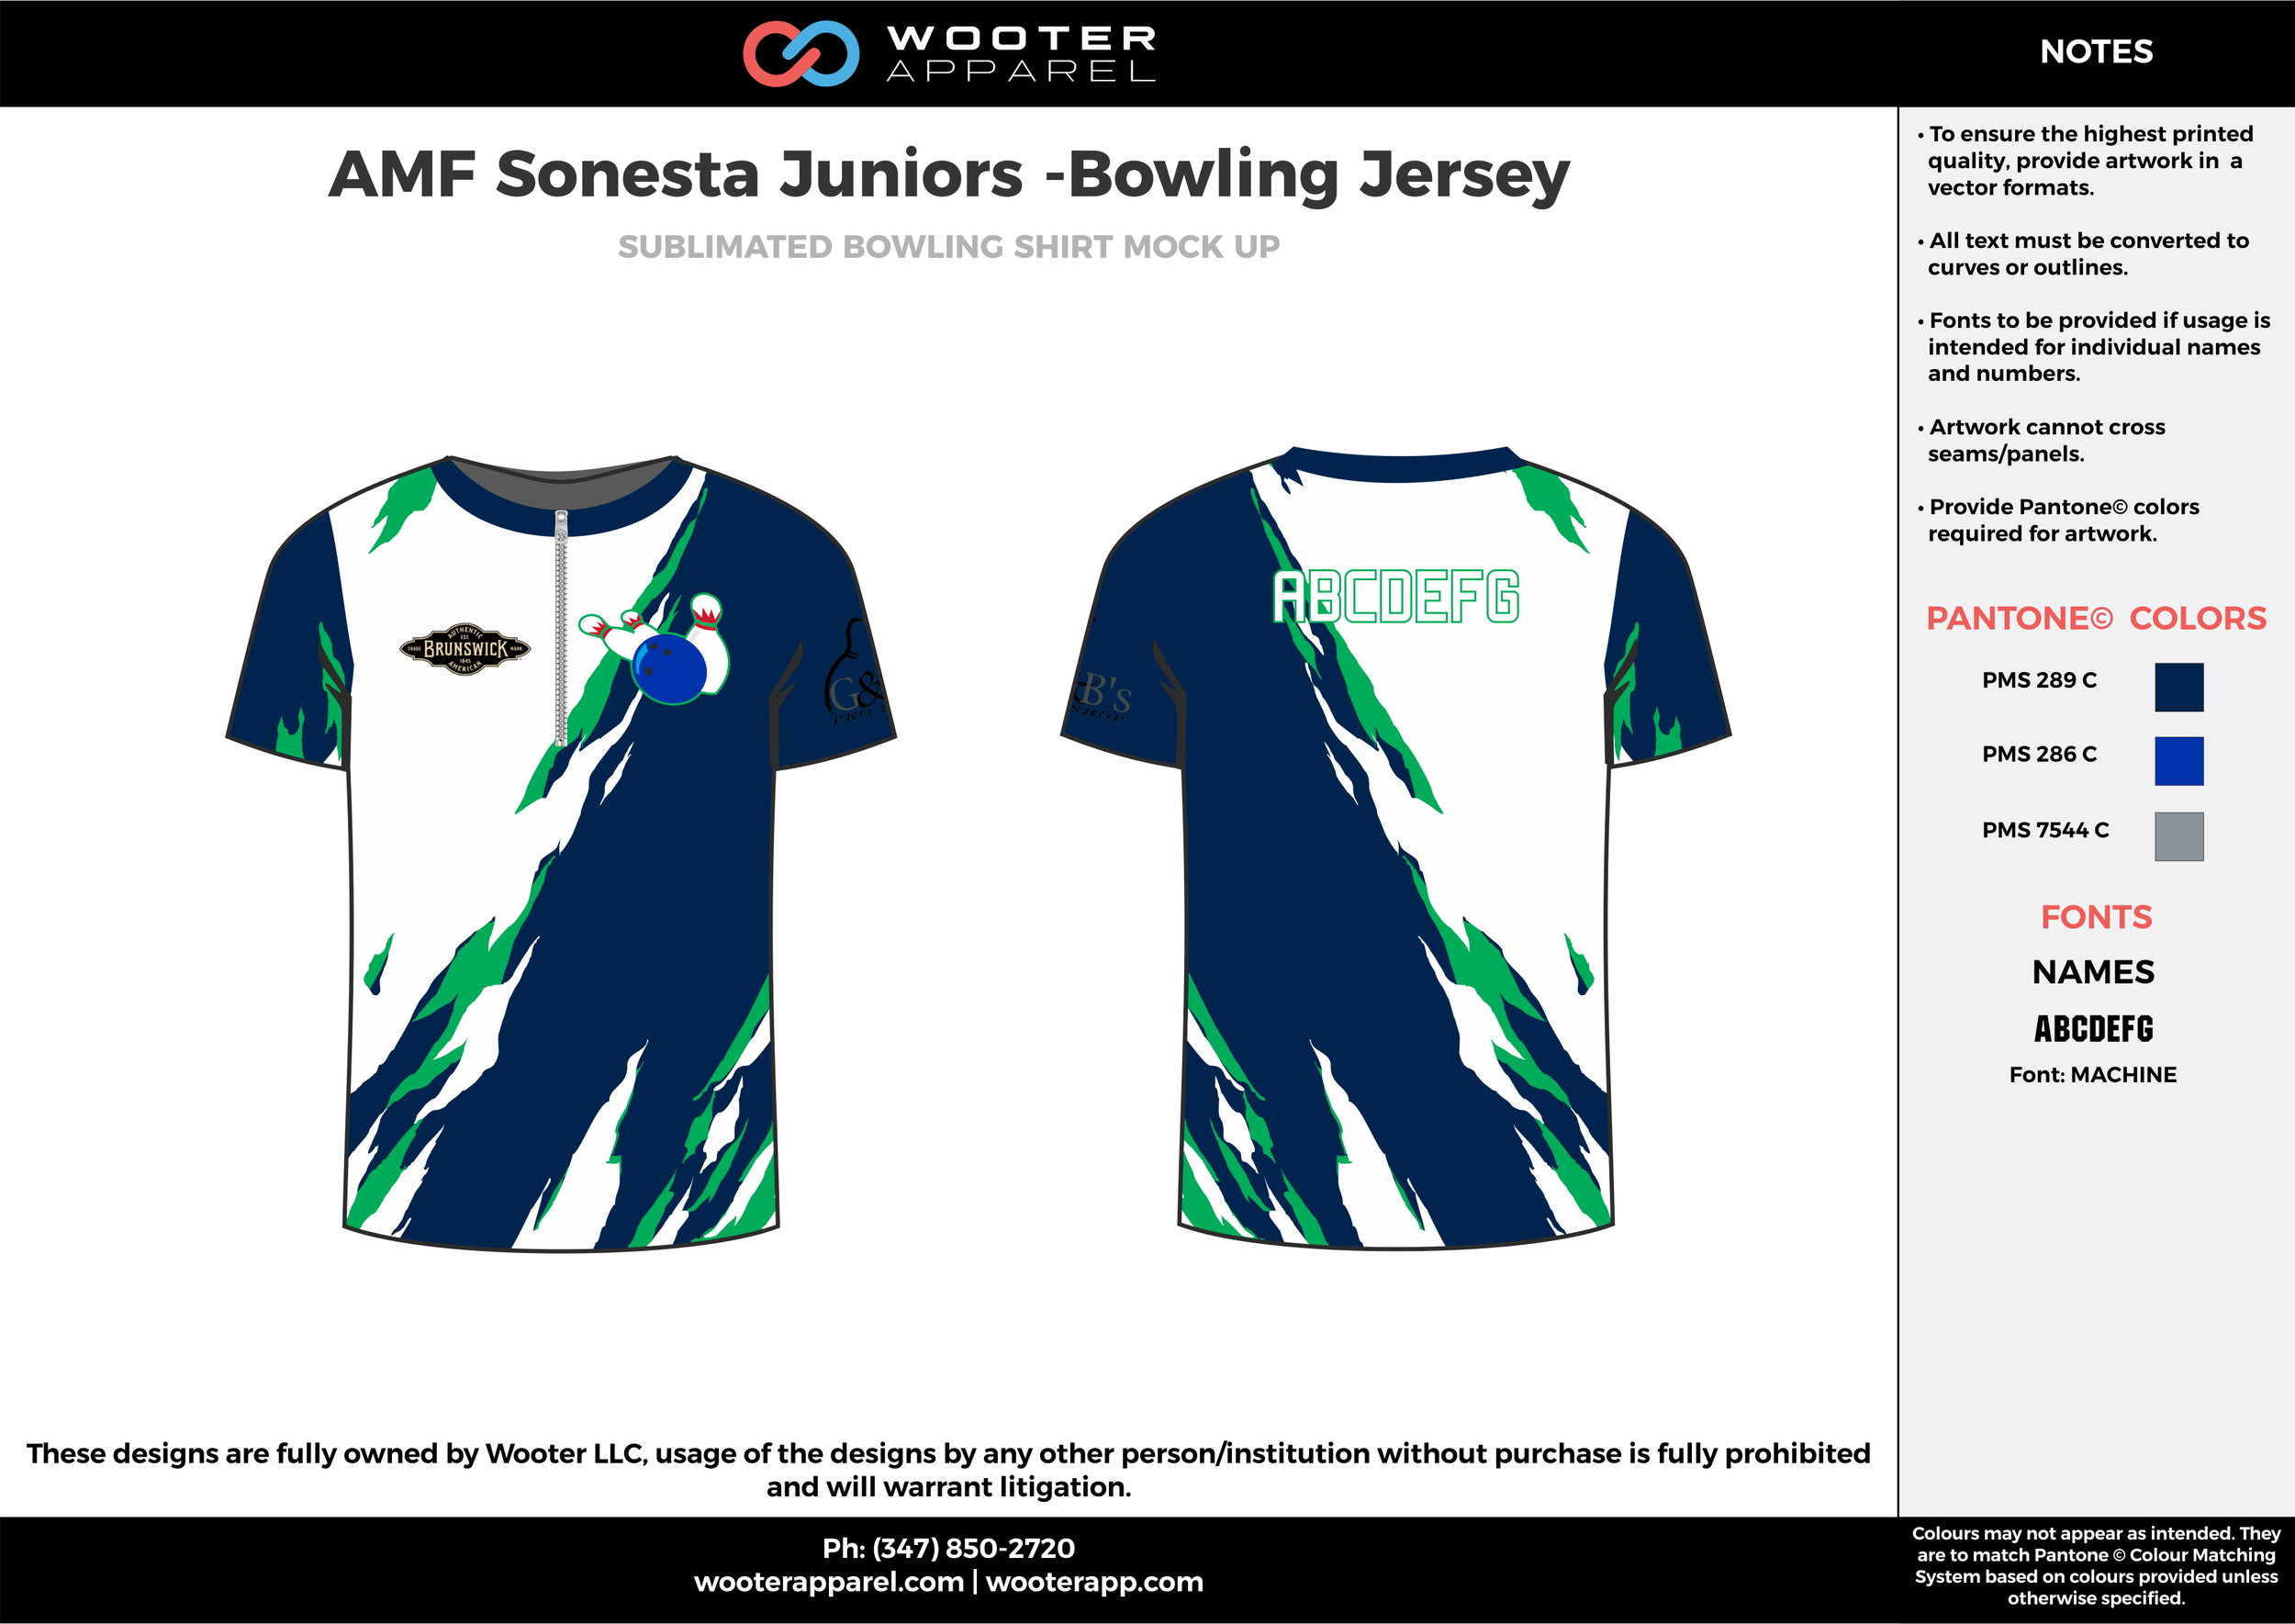 AMF Sonesta Juniors blue white green bowling uniforms, shirts, quarter zip polo